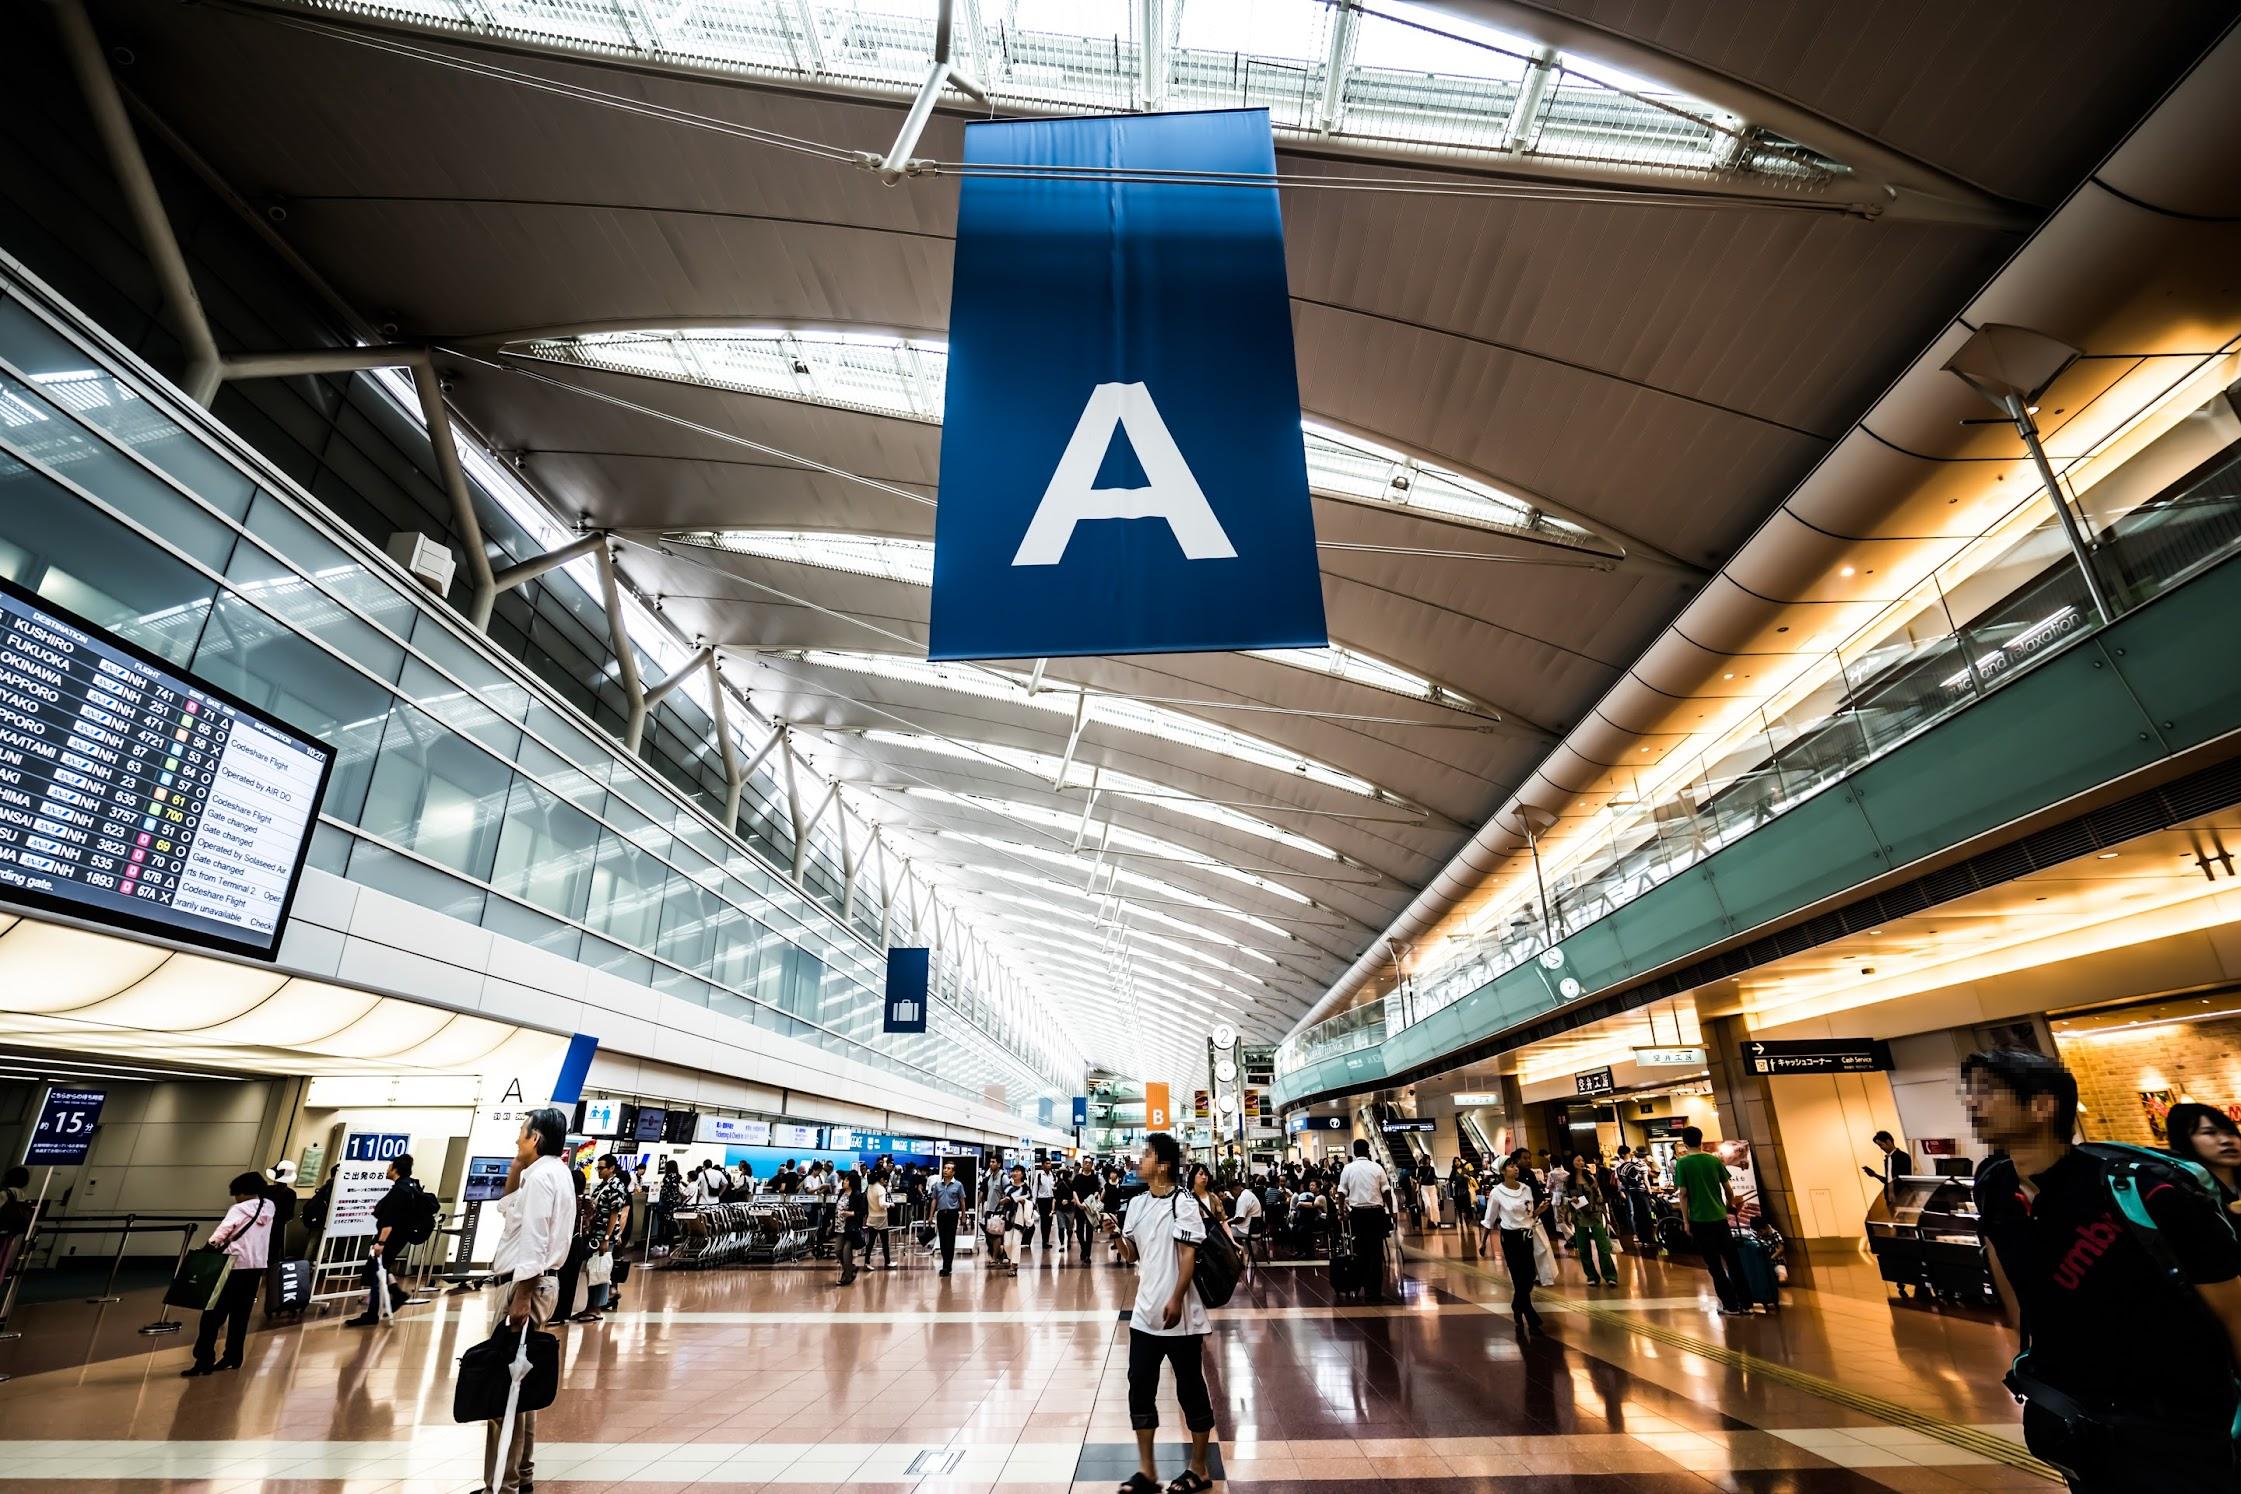 Haneda Airport departure lobby1